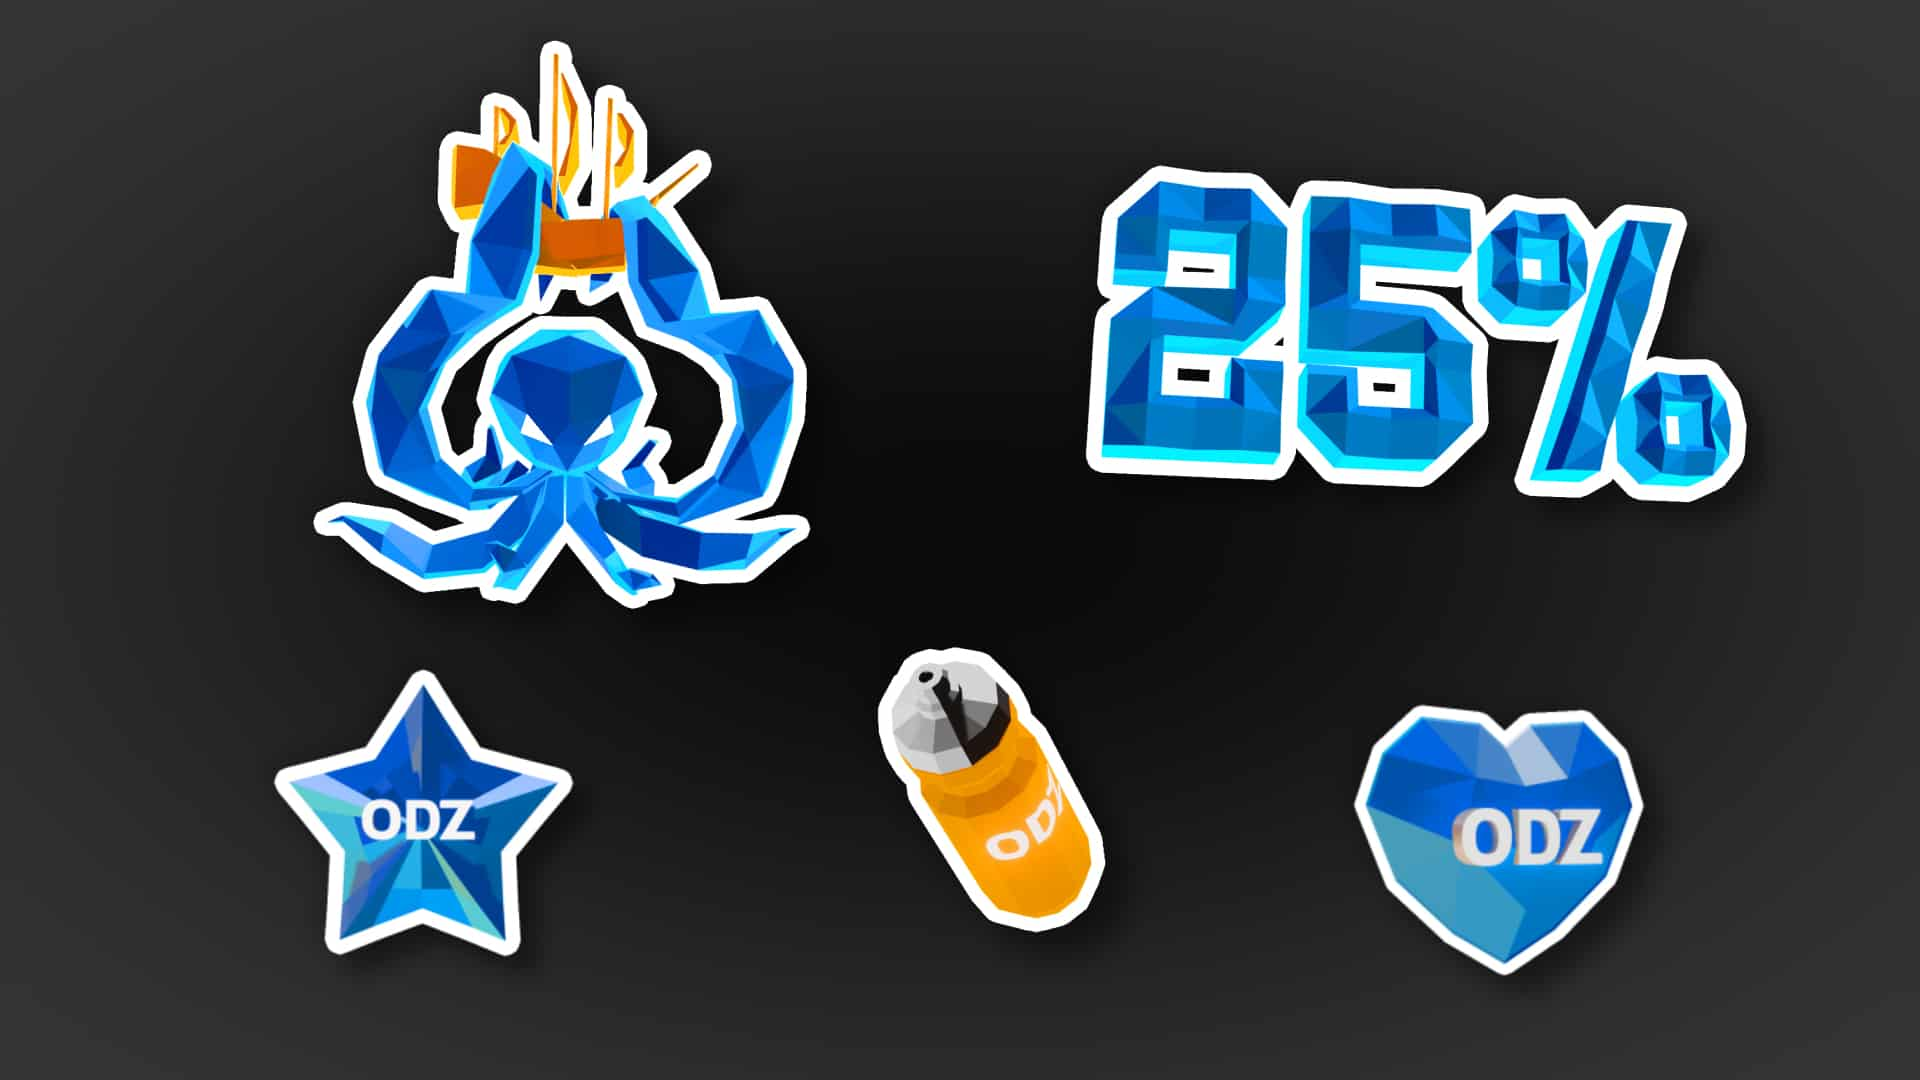 ODZ low-poly graphics: kraken, 25%, star, bidon, heart